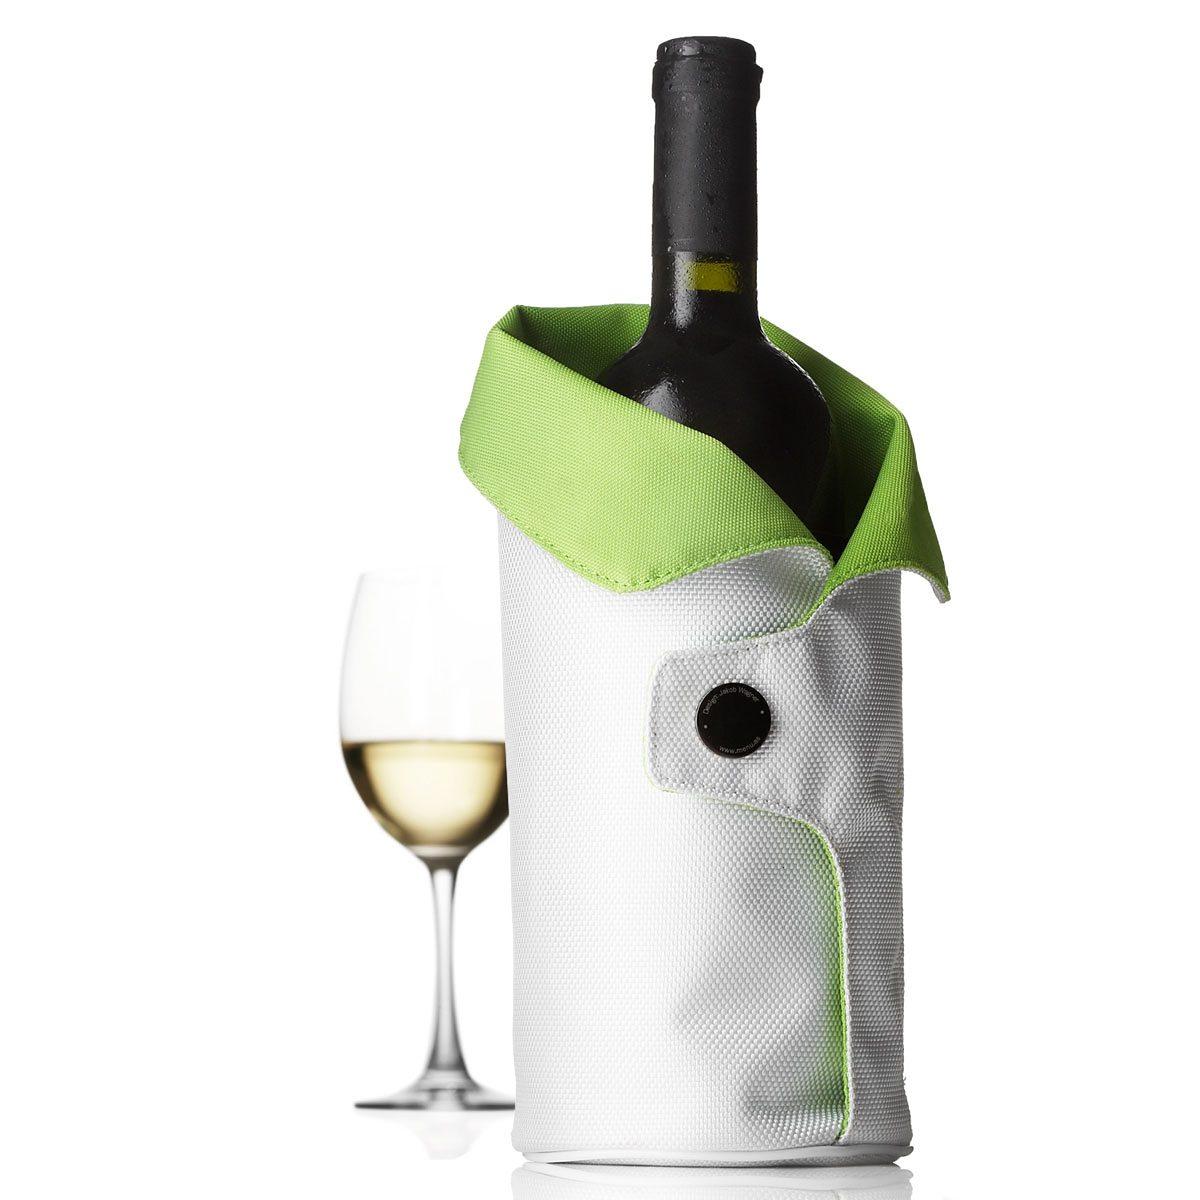 MENU Menu Weinkühler COOL COAT weiß-grün